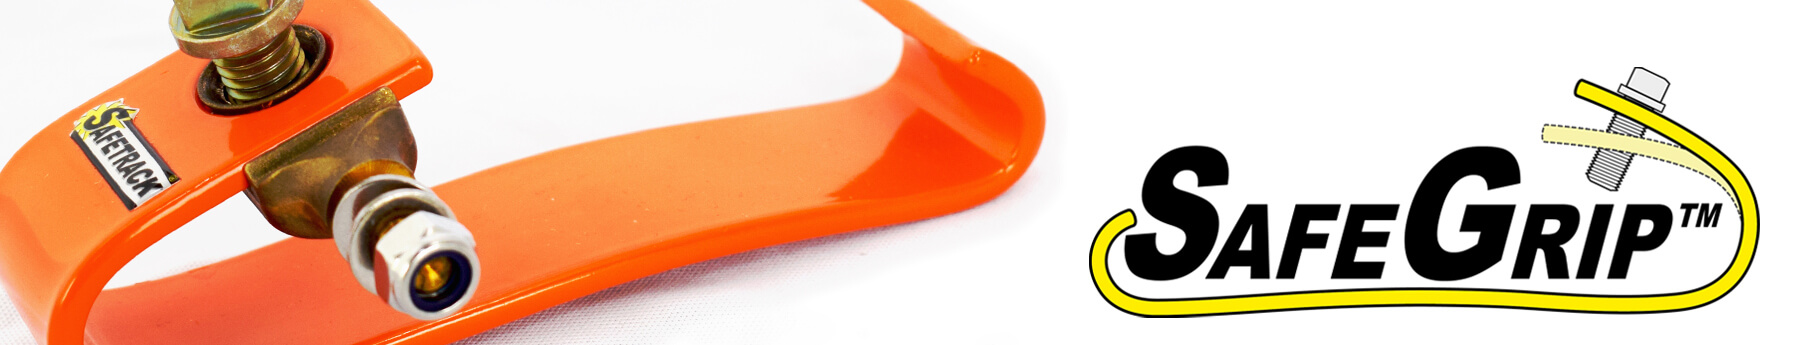 pinb-slide-2